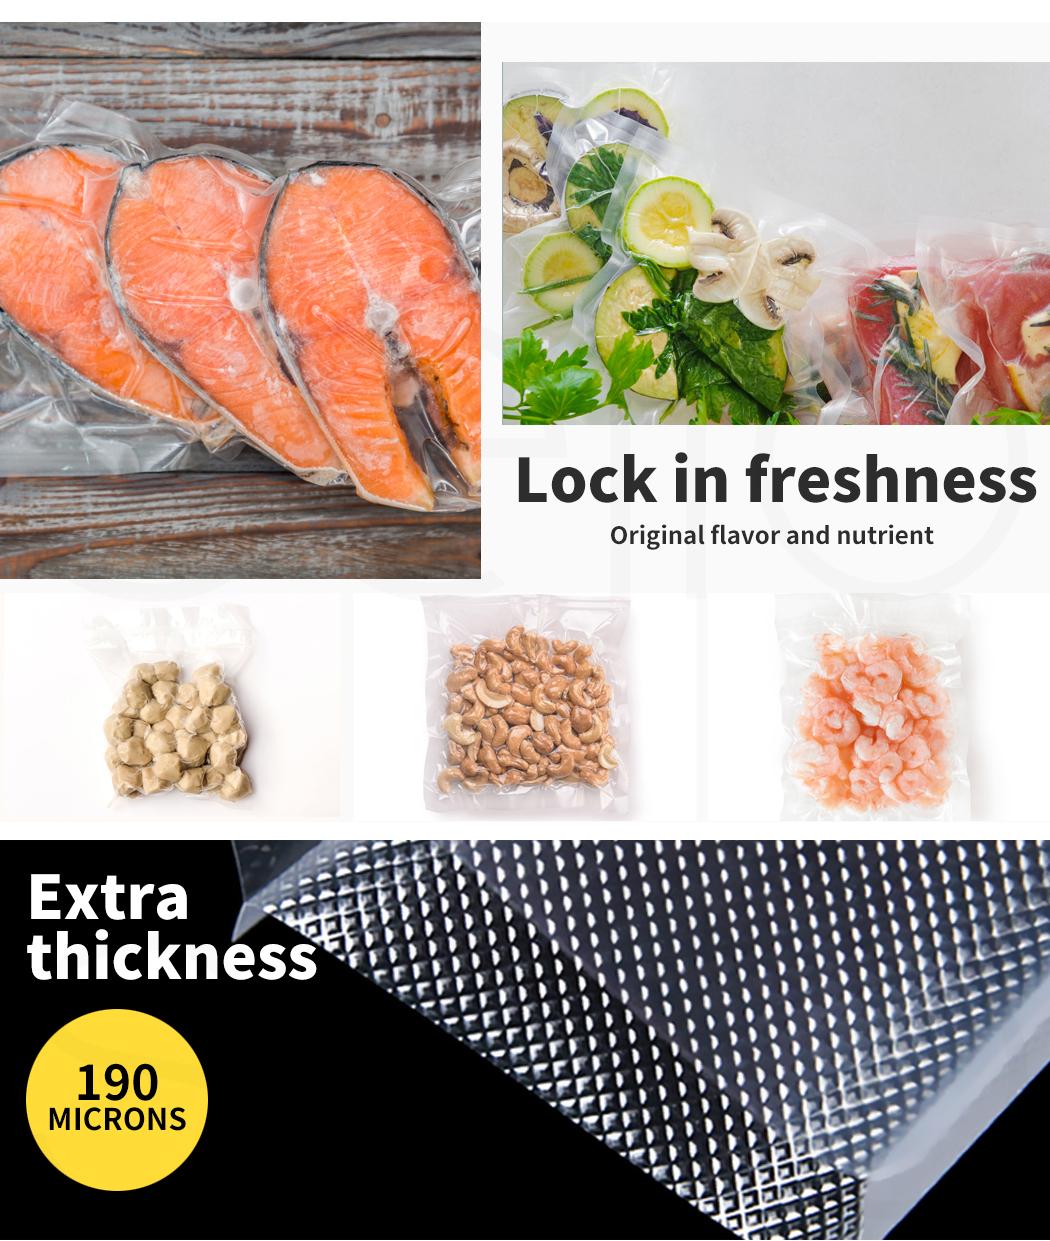 thumbnail 126 - Vacuum Food Sealer Storage Bags Saver Seal Bags Commercial Heat 100/200/500x